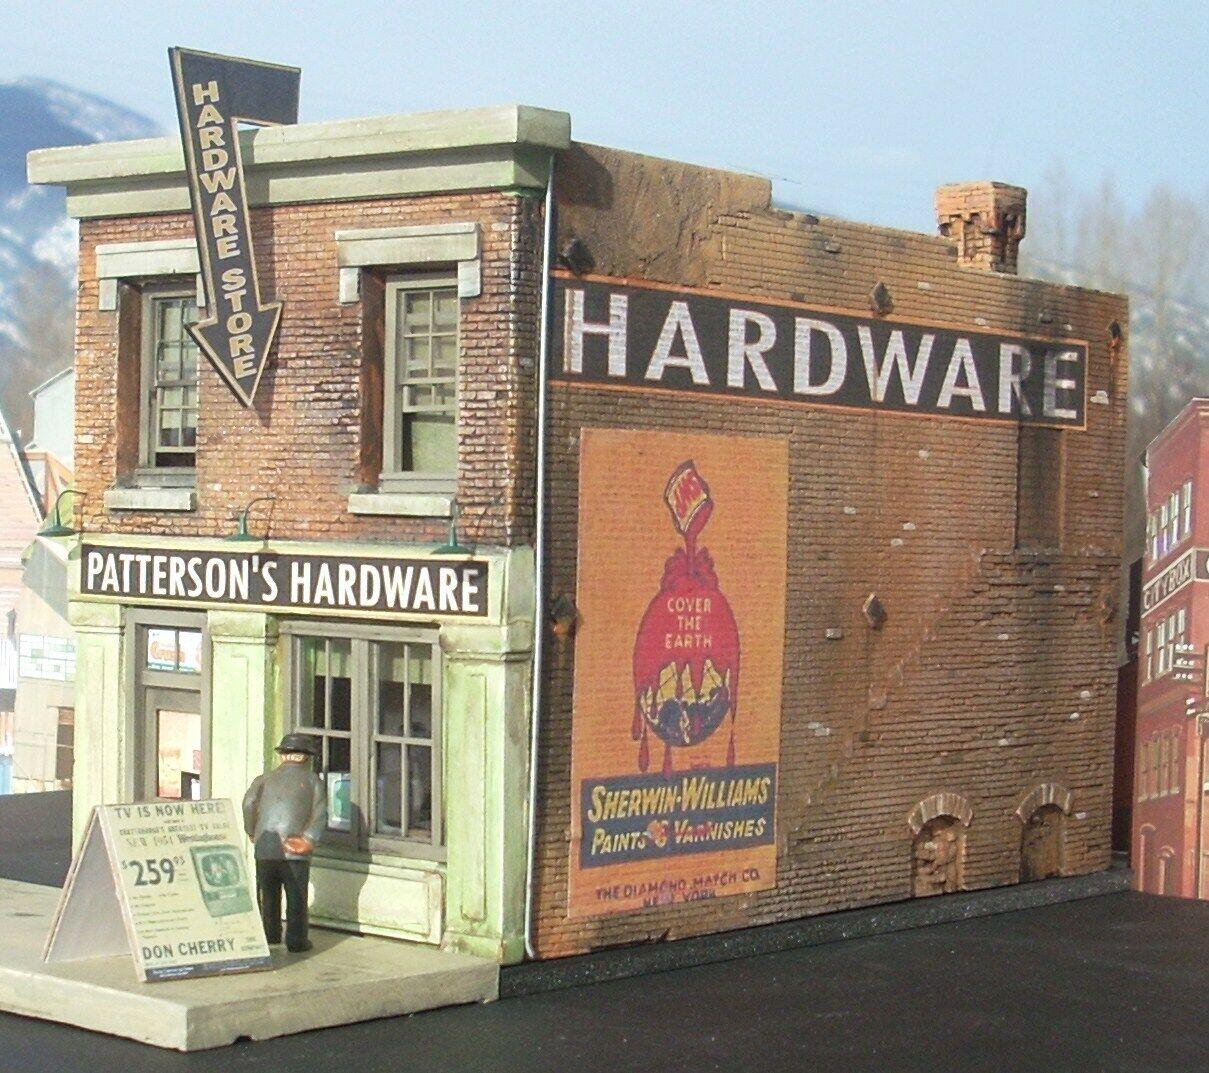 Centro tienda de hardware Deco 48 o escala modelo del FerroCocheril Tren builidng Envío Gratis